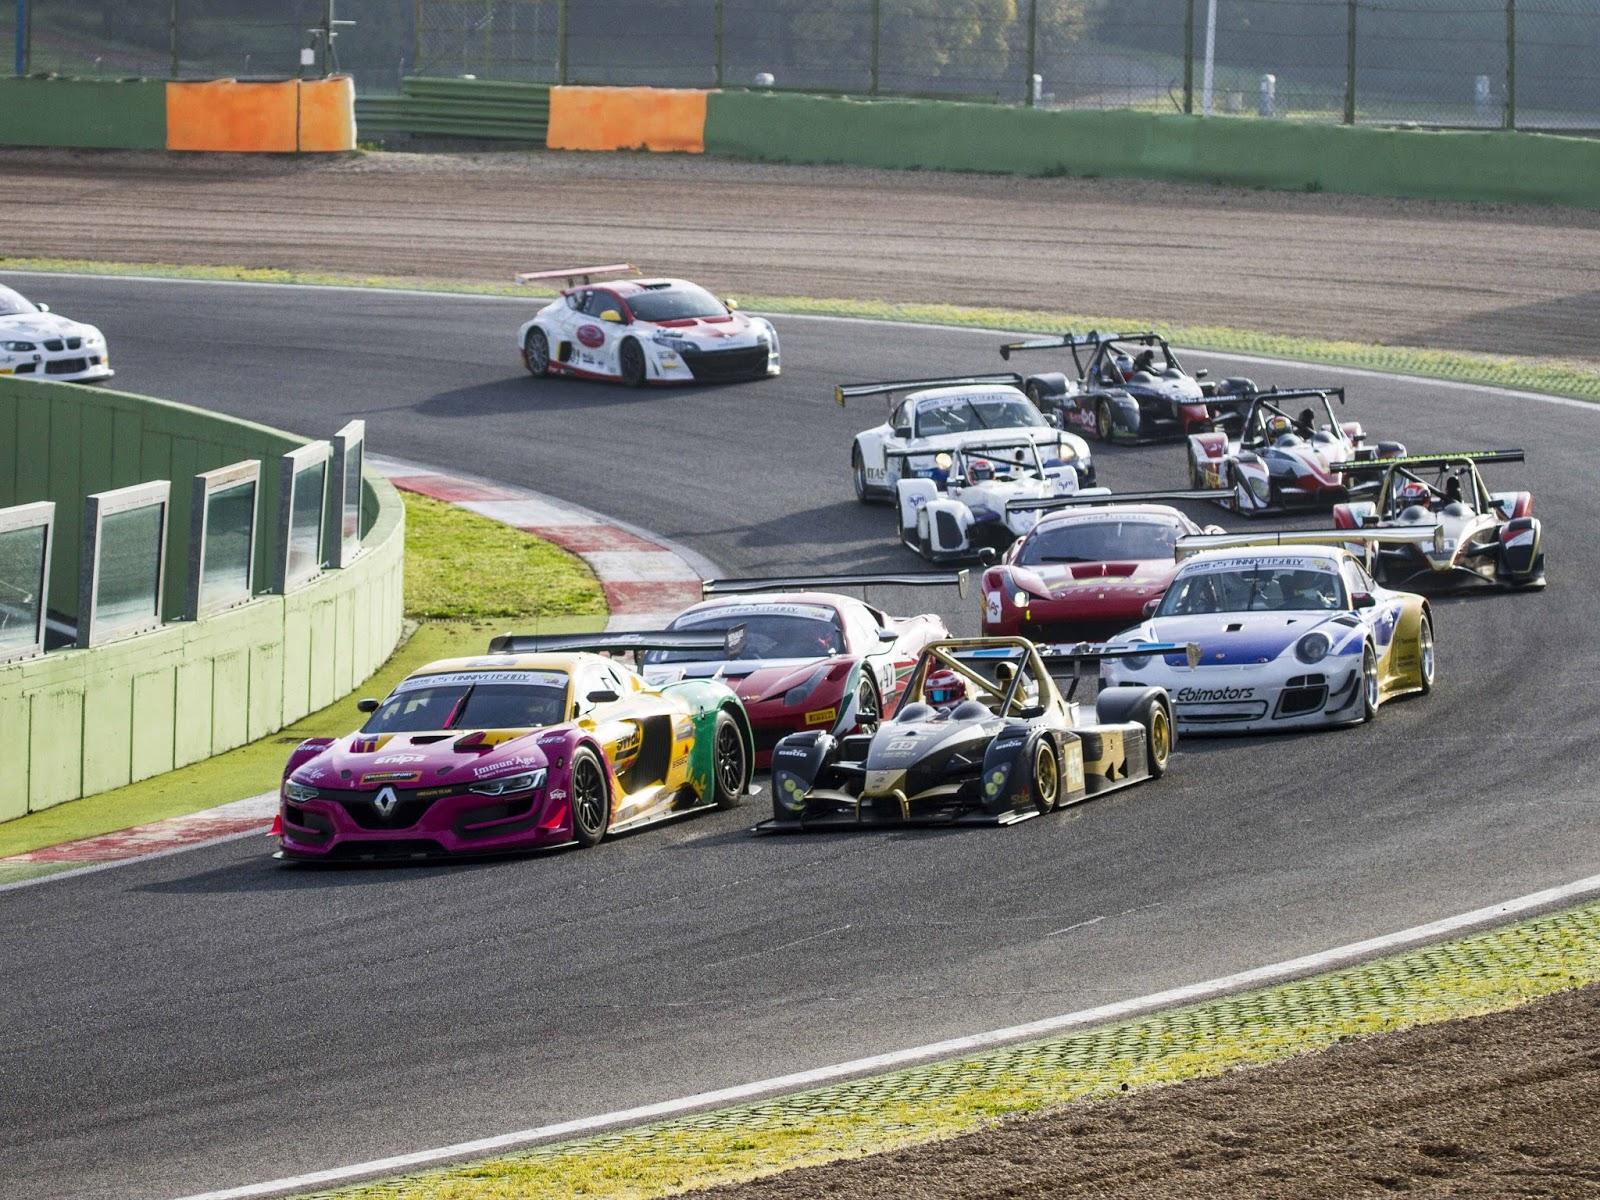 Circuito Vallelunga : Abarth protagonista del weekend a vallelunga motorinolimits